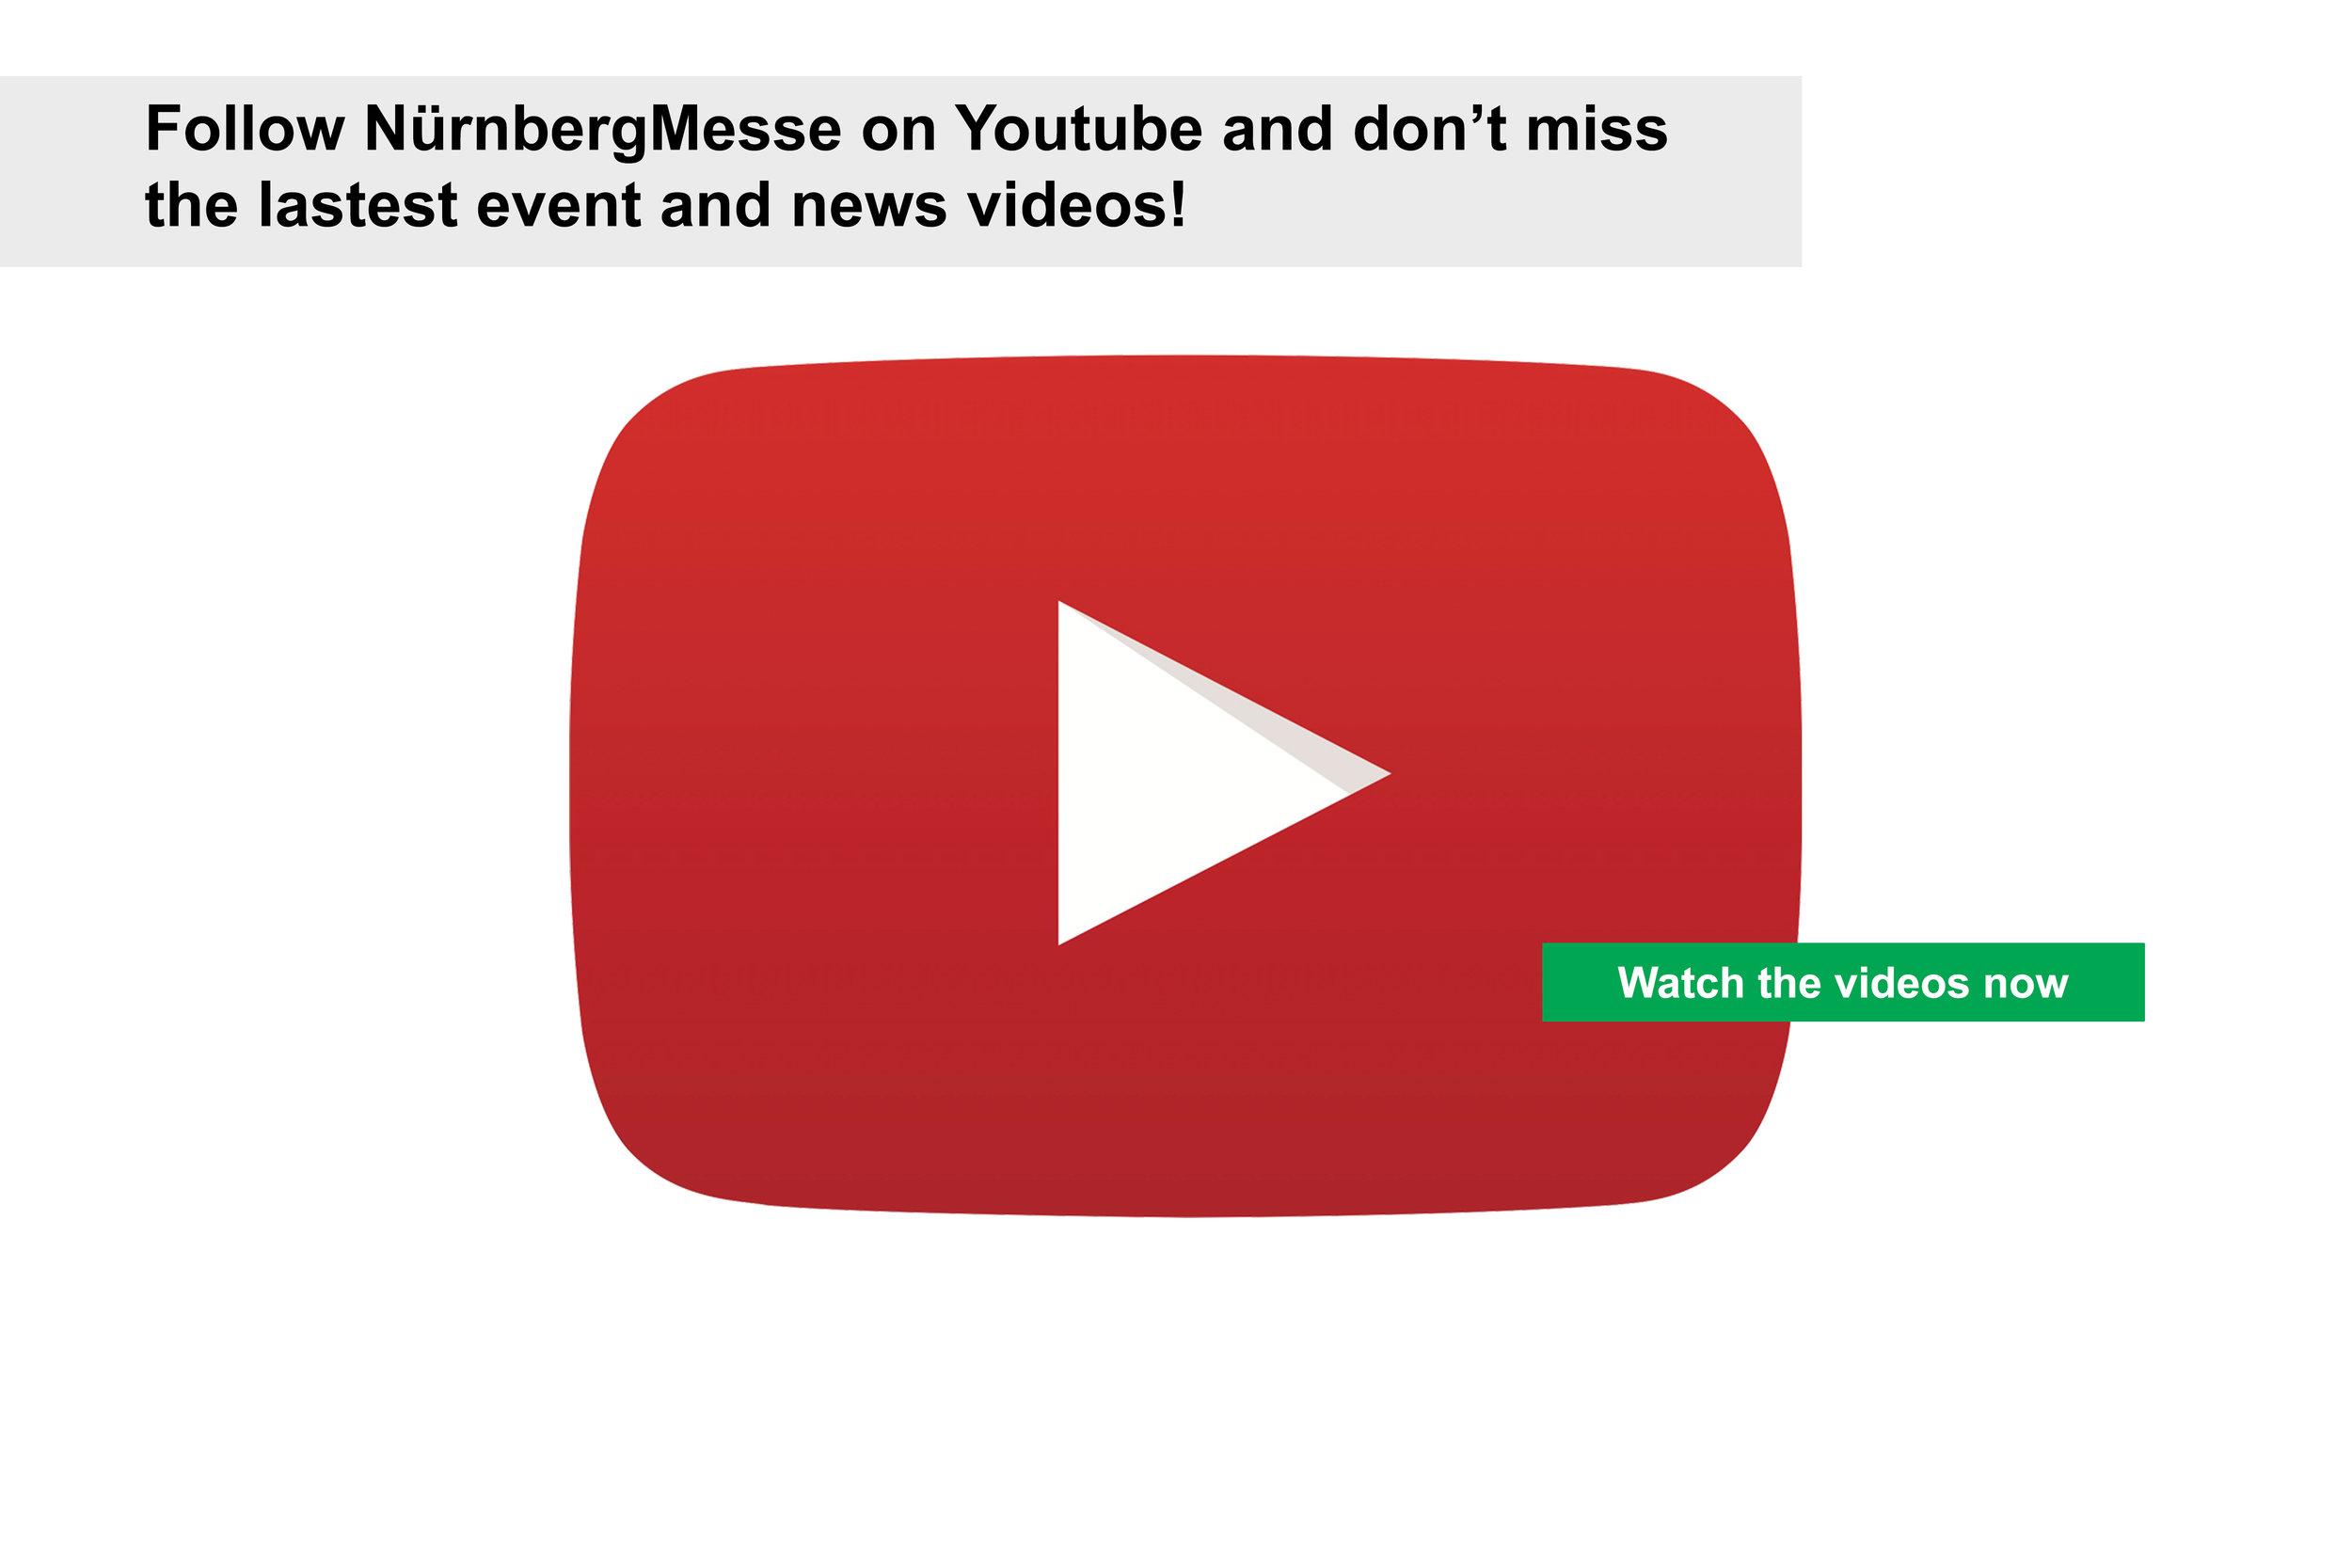 youtube_en.jpg